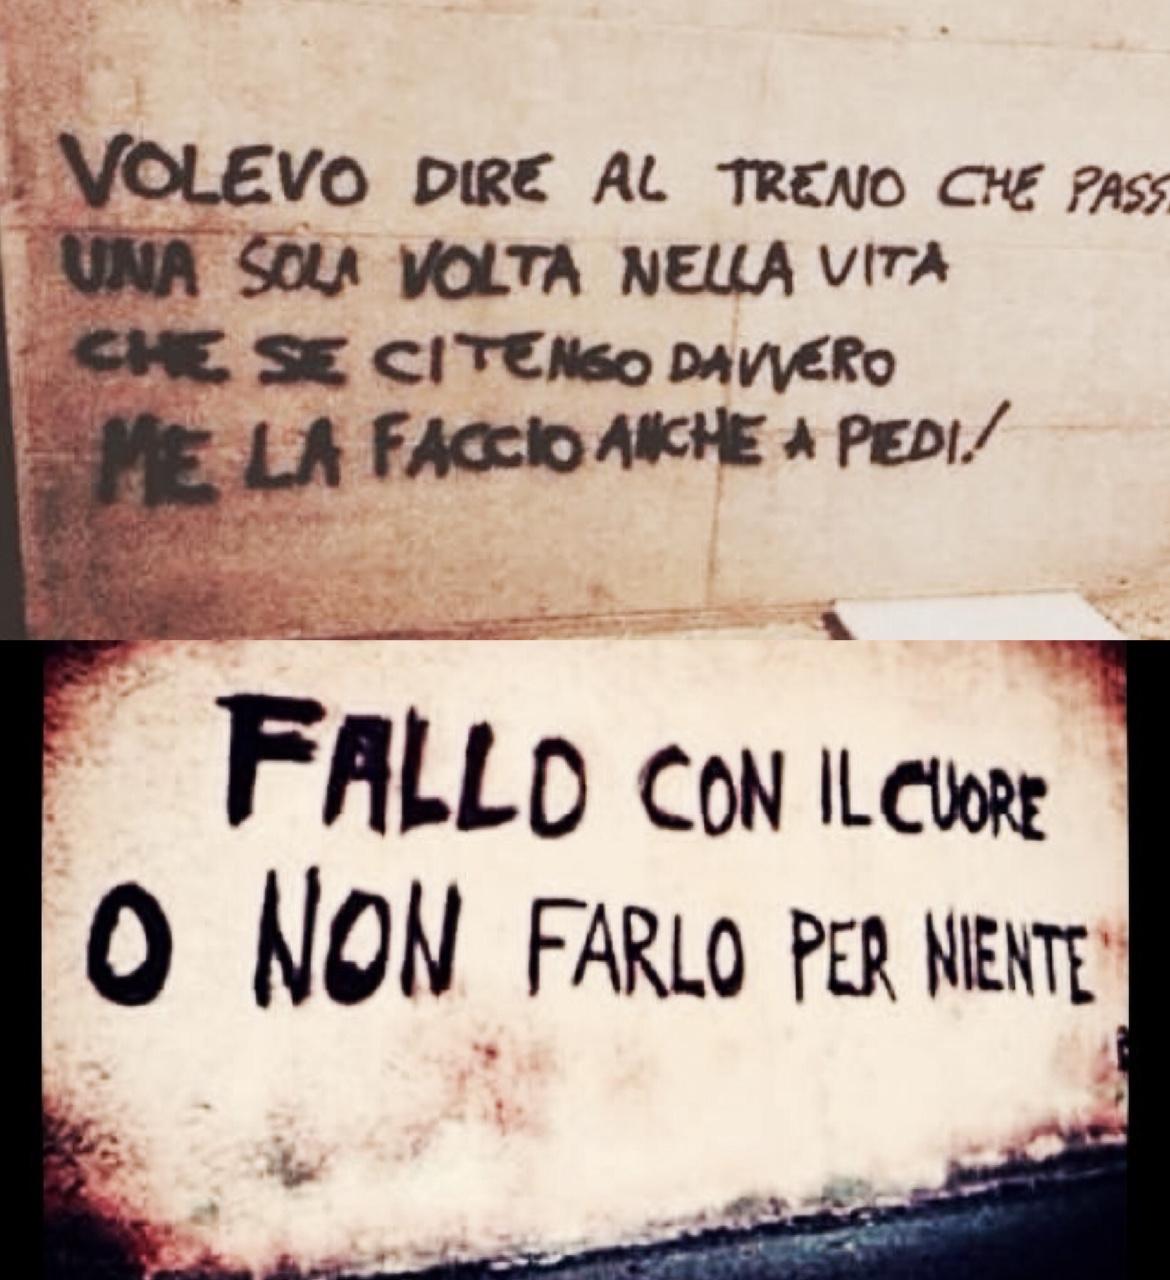 Messaggi d amore sui muri i hate bananas - Frasi scritte sui muri di casa ...